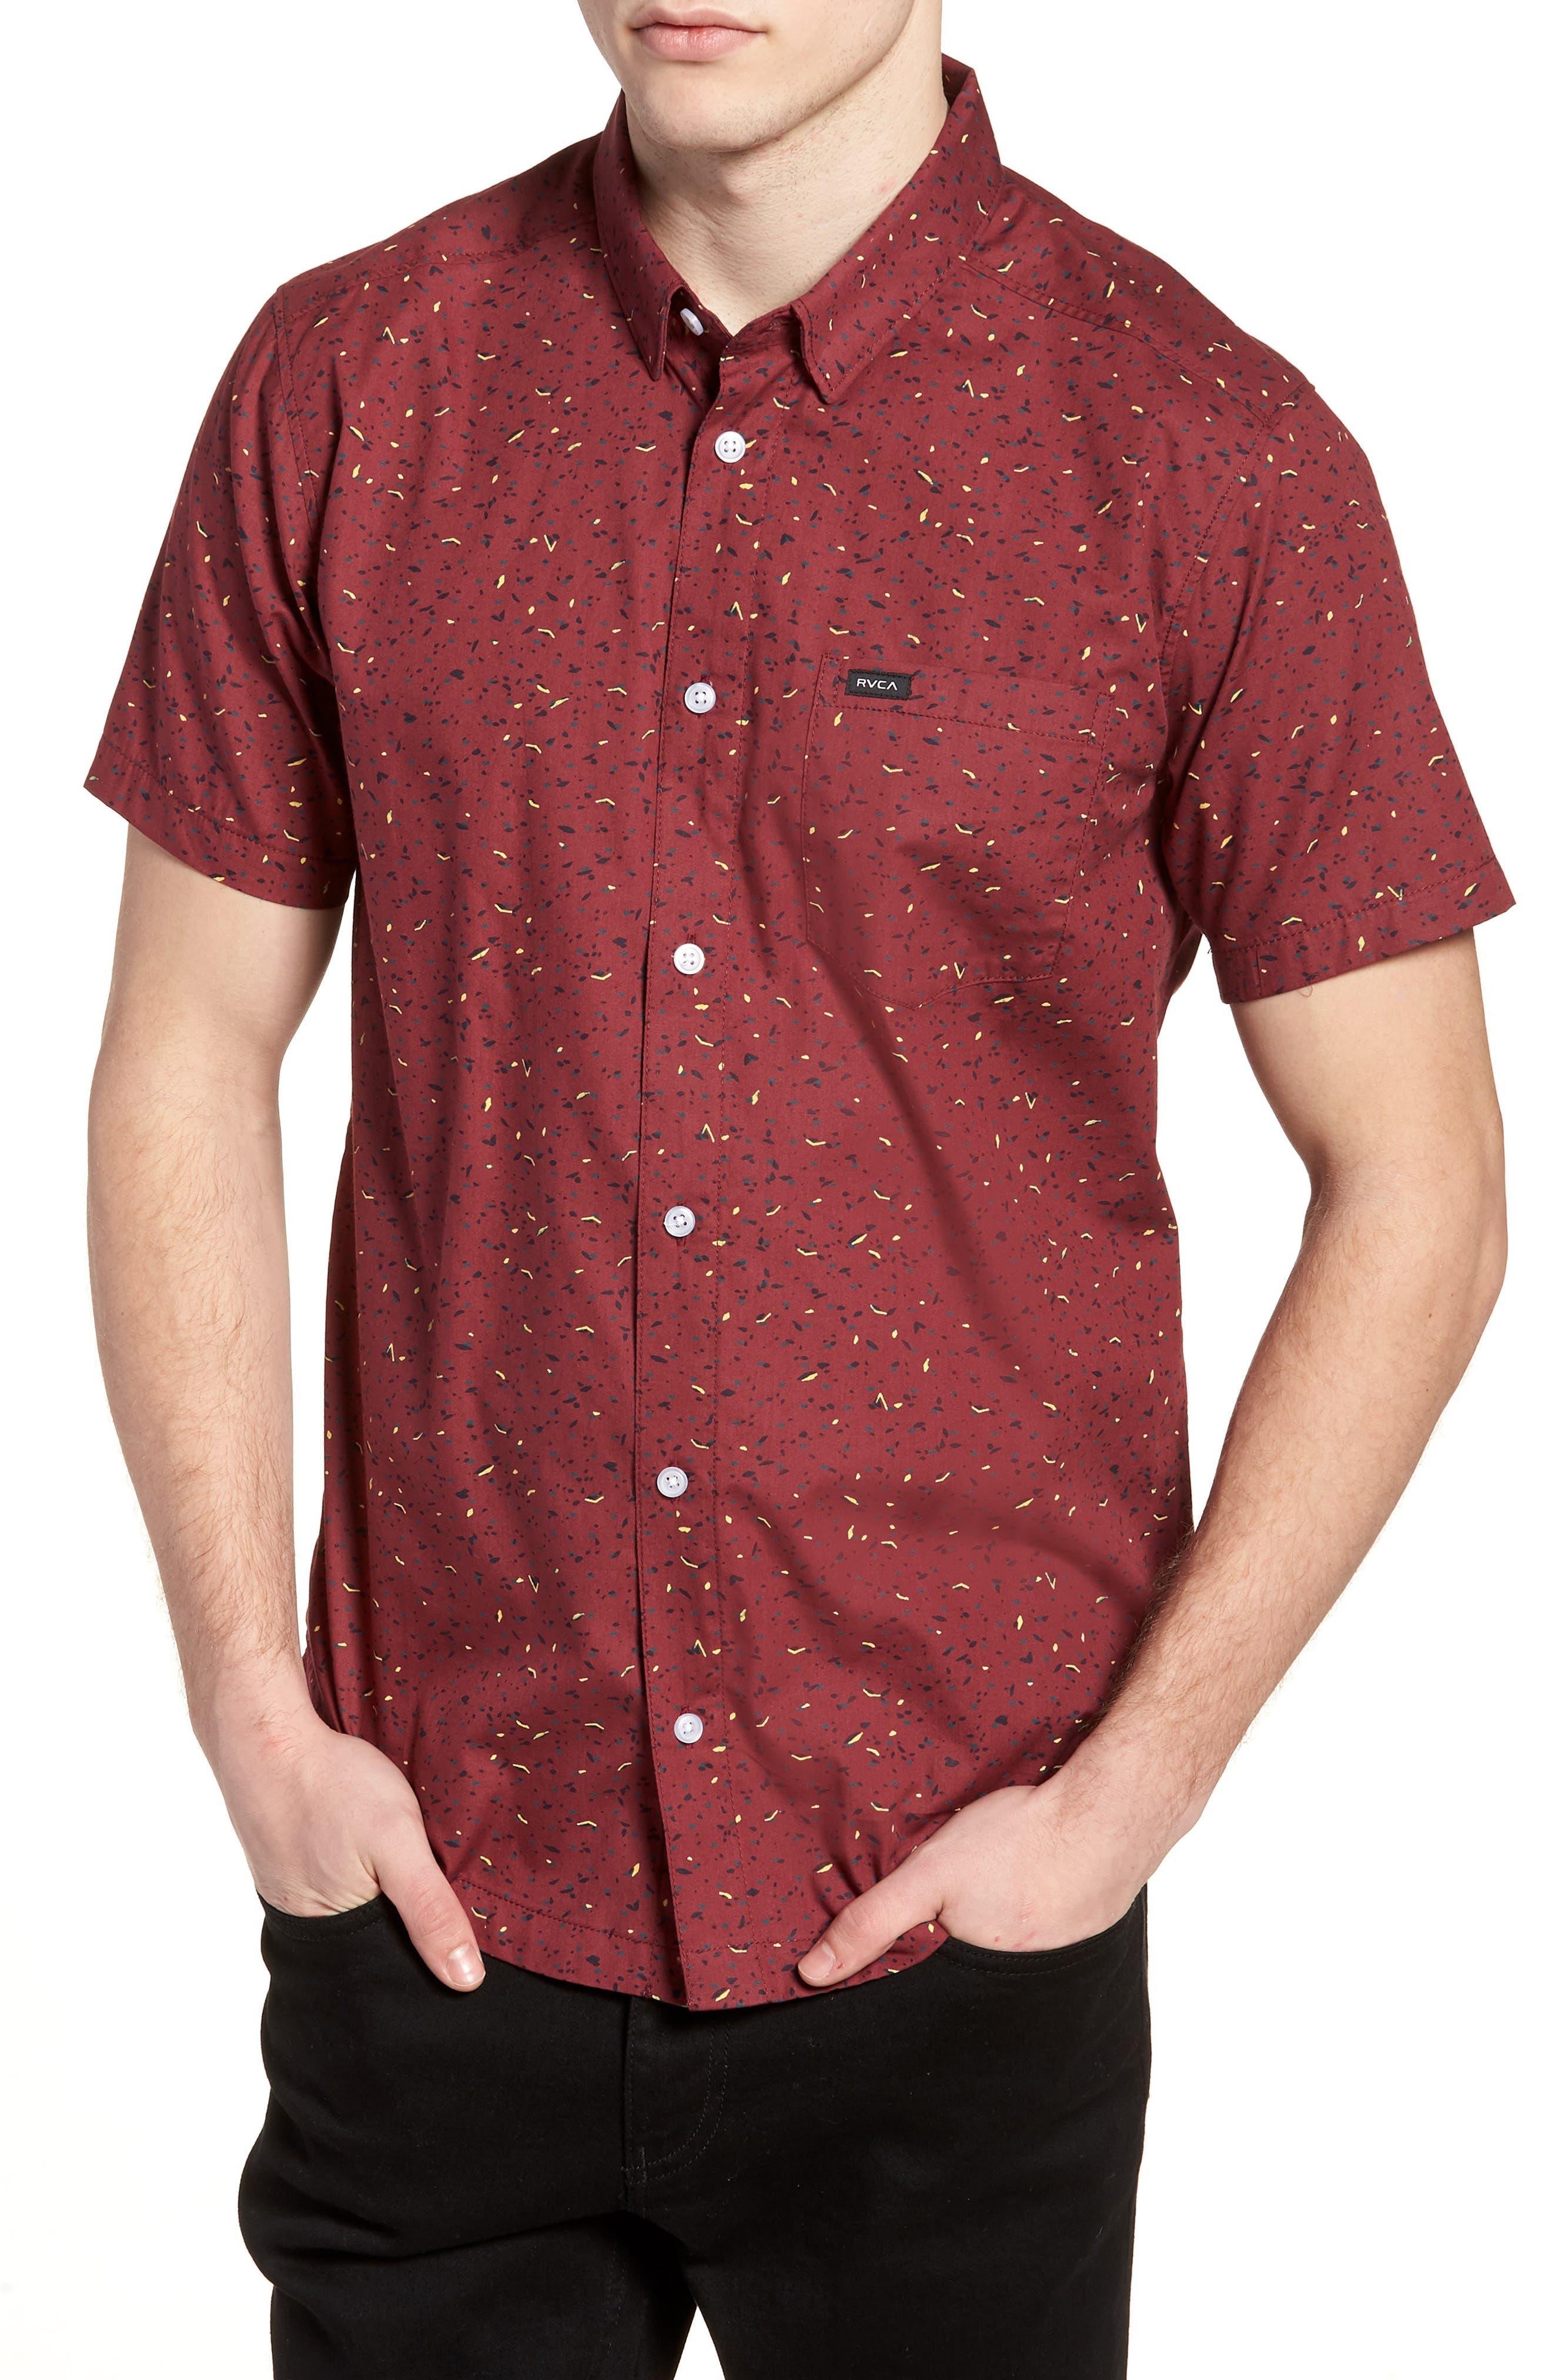 Jaded Woven Shirt,                         Main,                         color, Tawny Port